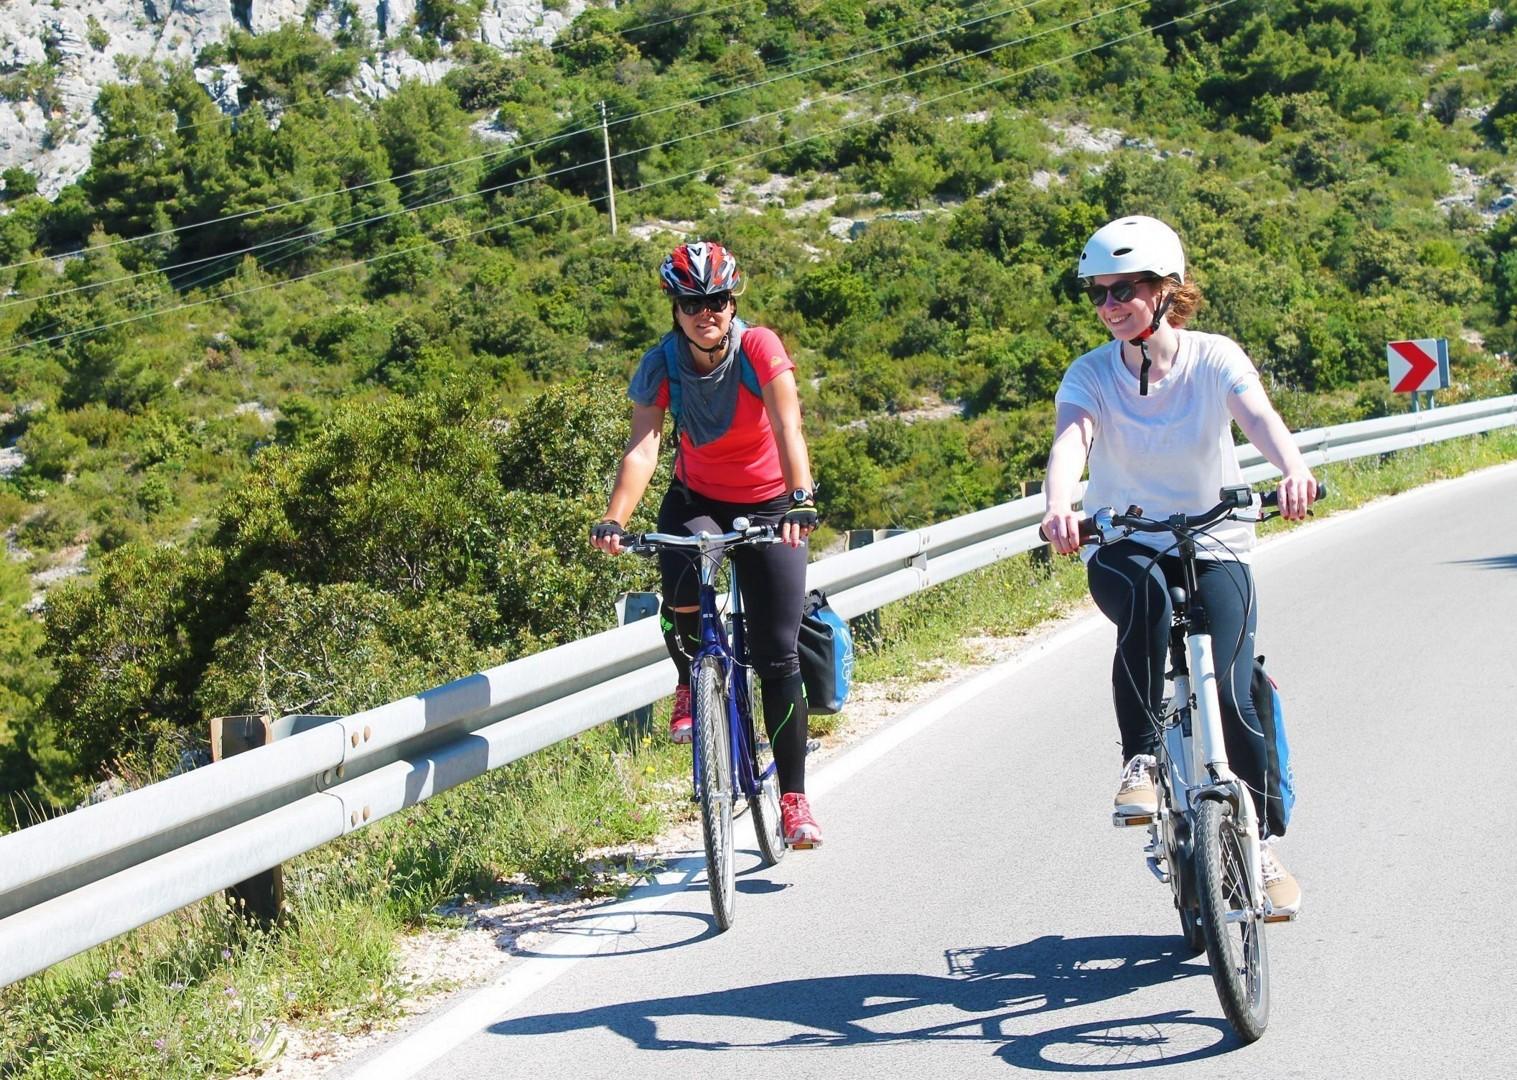 leisure-cycling-holiday-island-stunning-views-fun-filled.jpg - Croatia - Kvarner Bay - Bike and Boat Holiday - Leisure Cycling